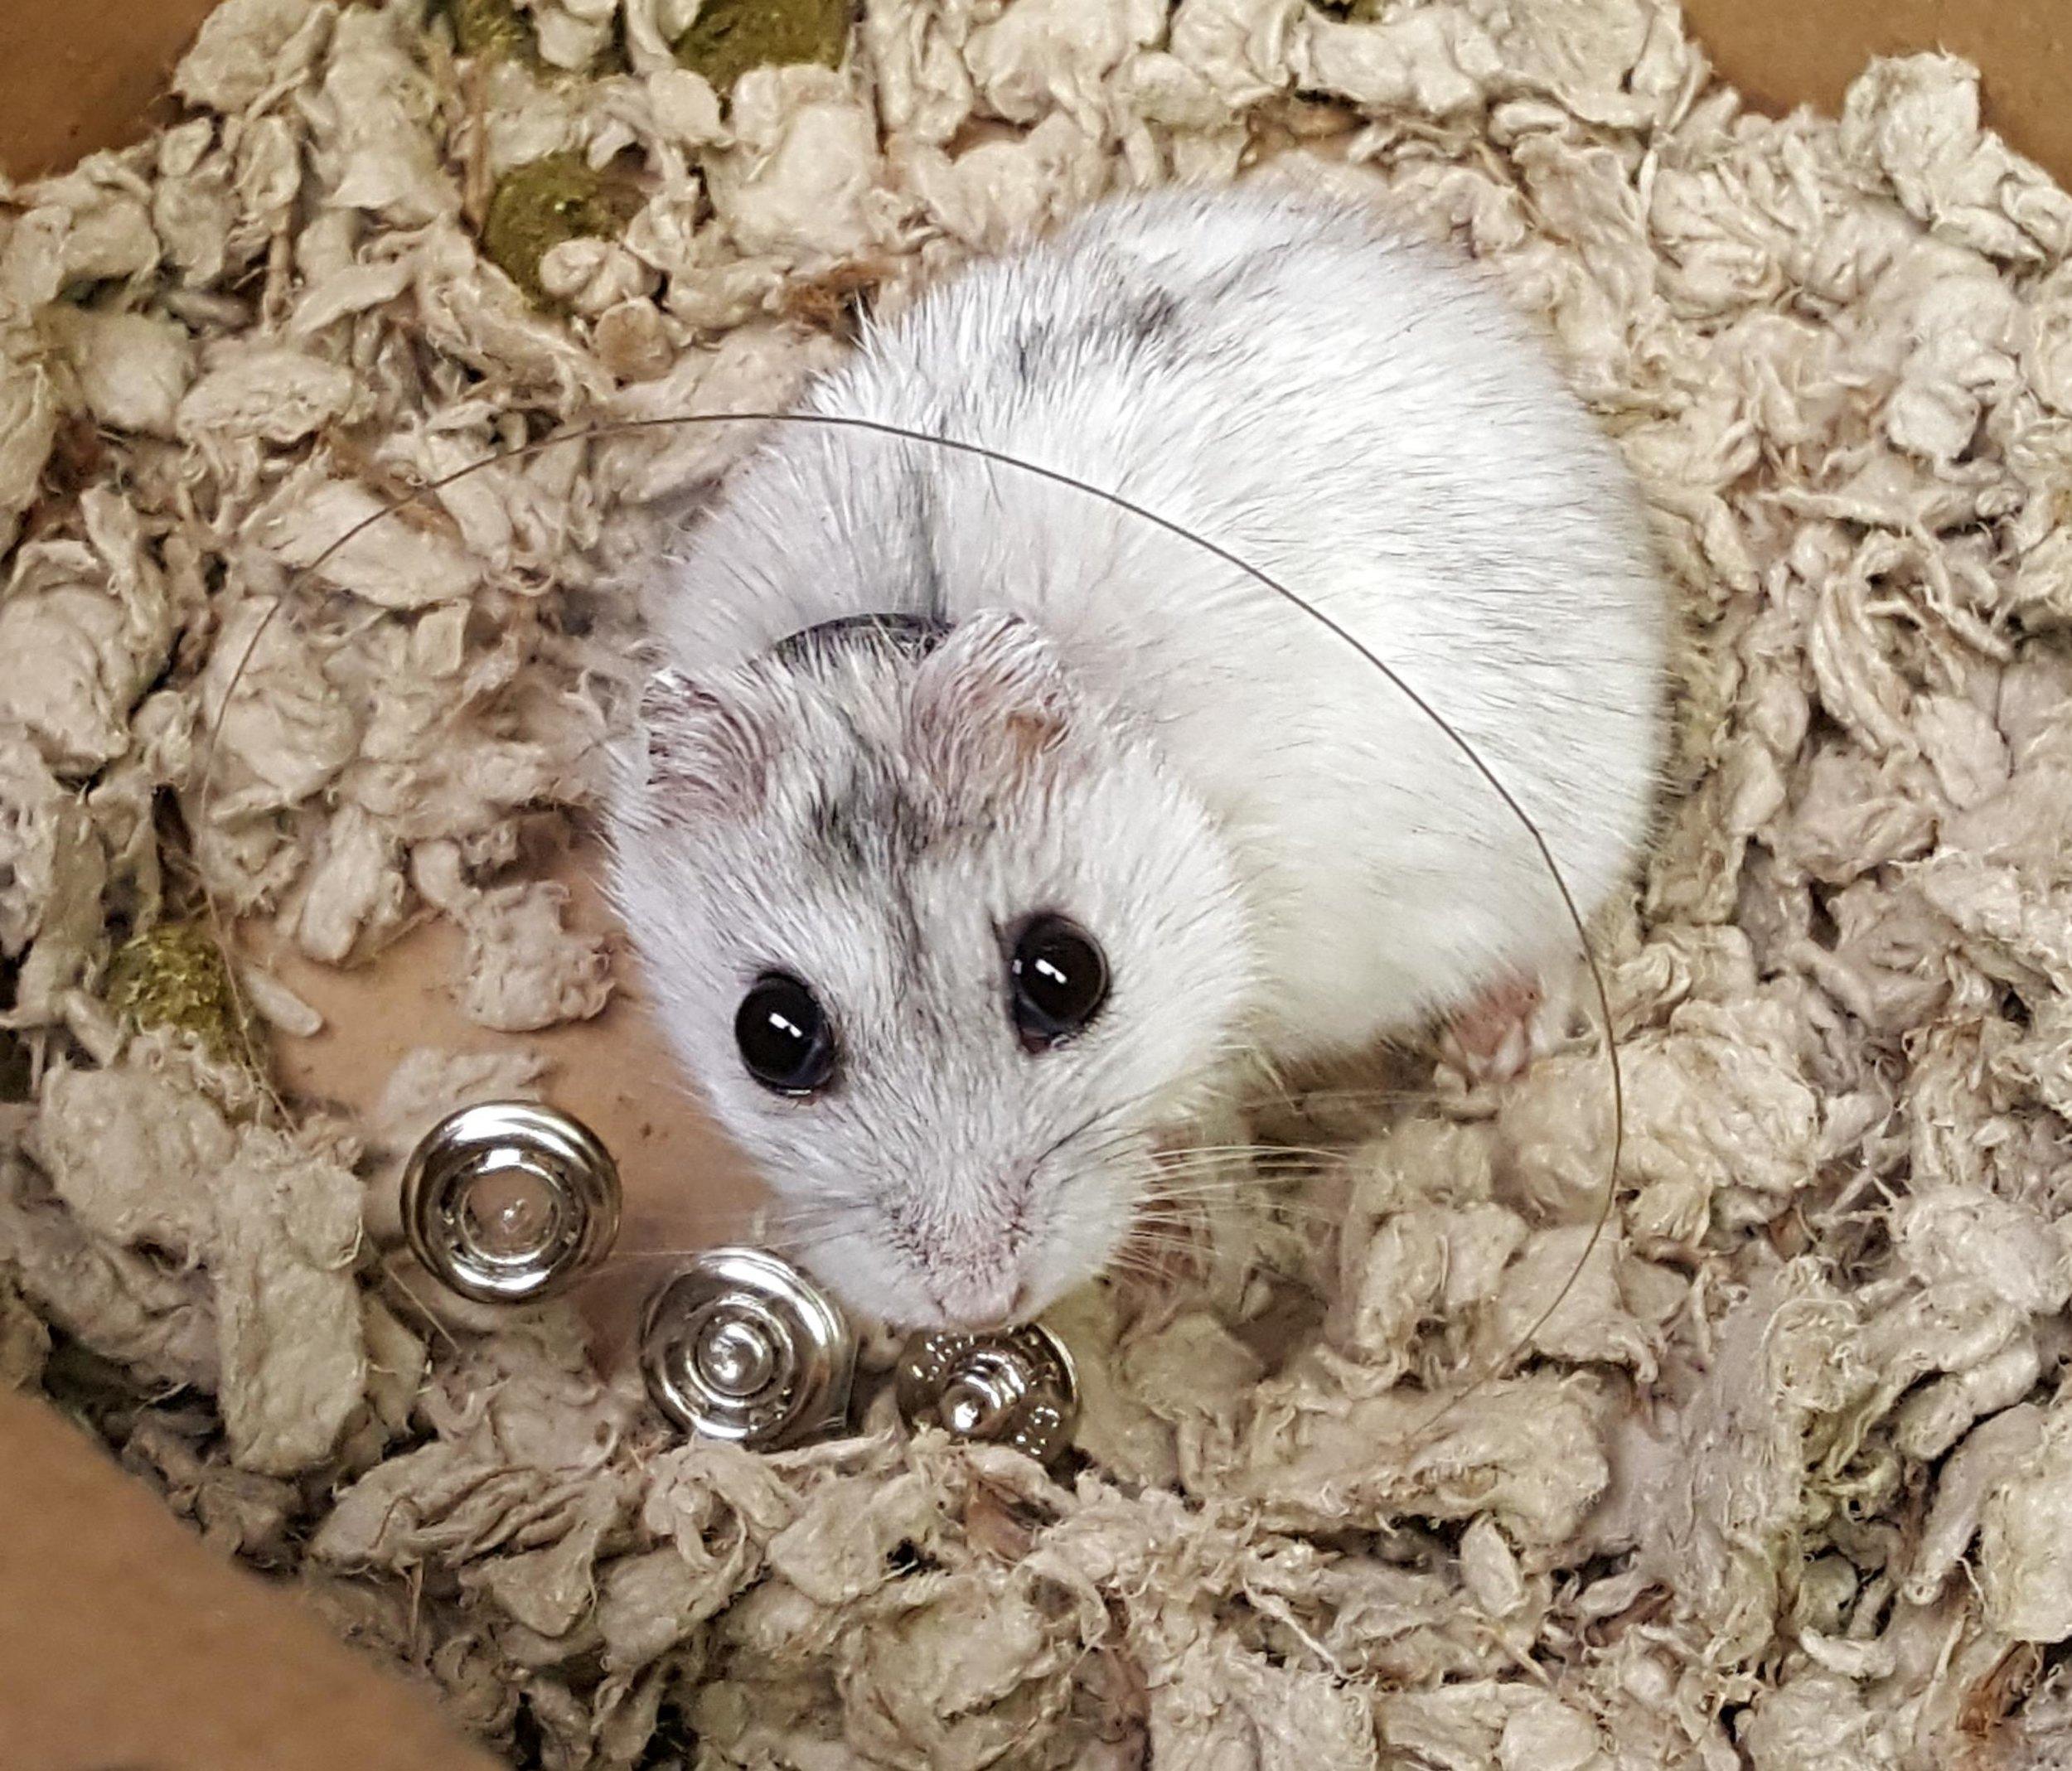 A hamster in an E-collar